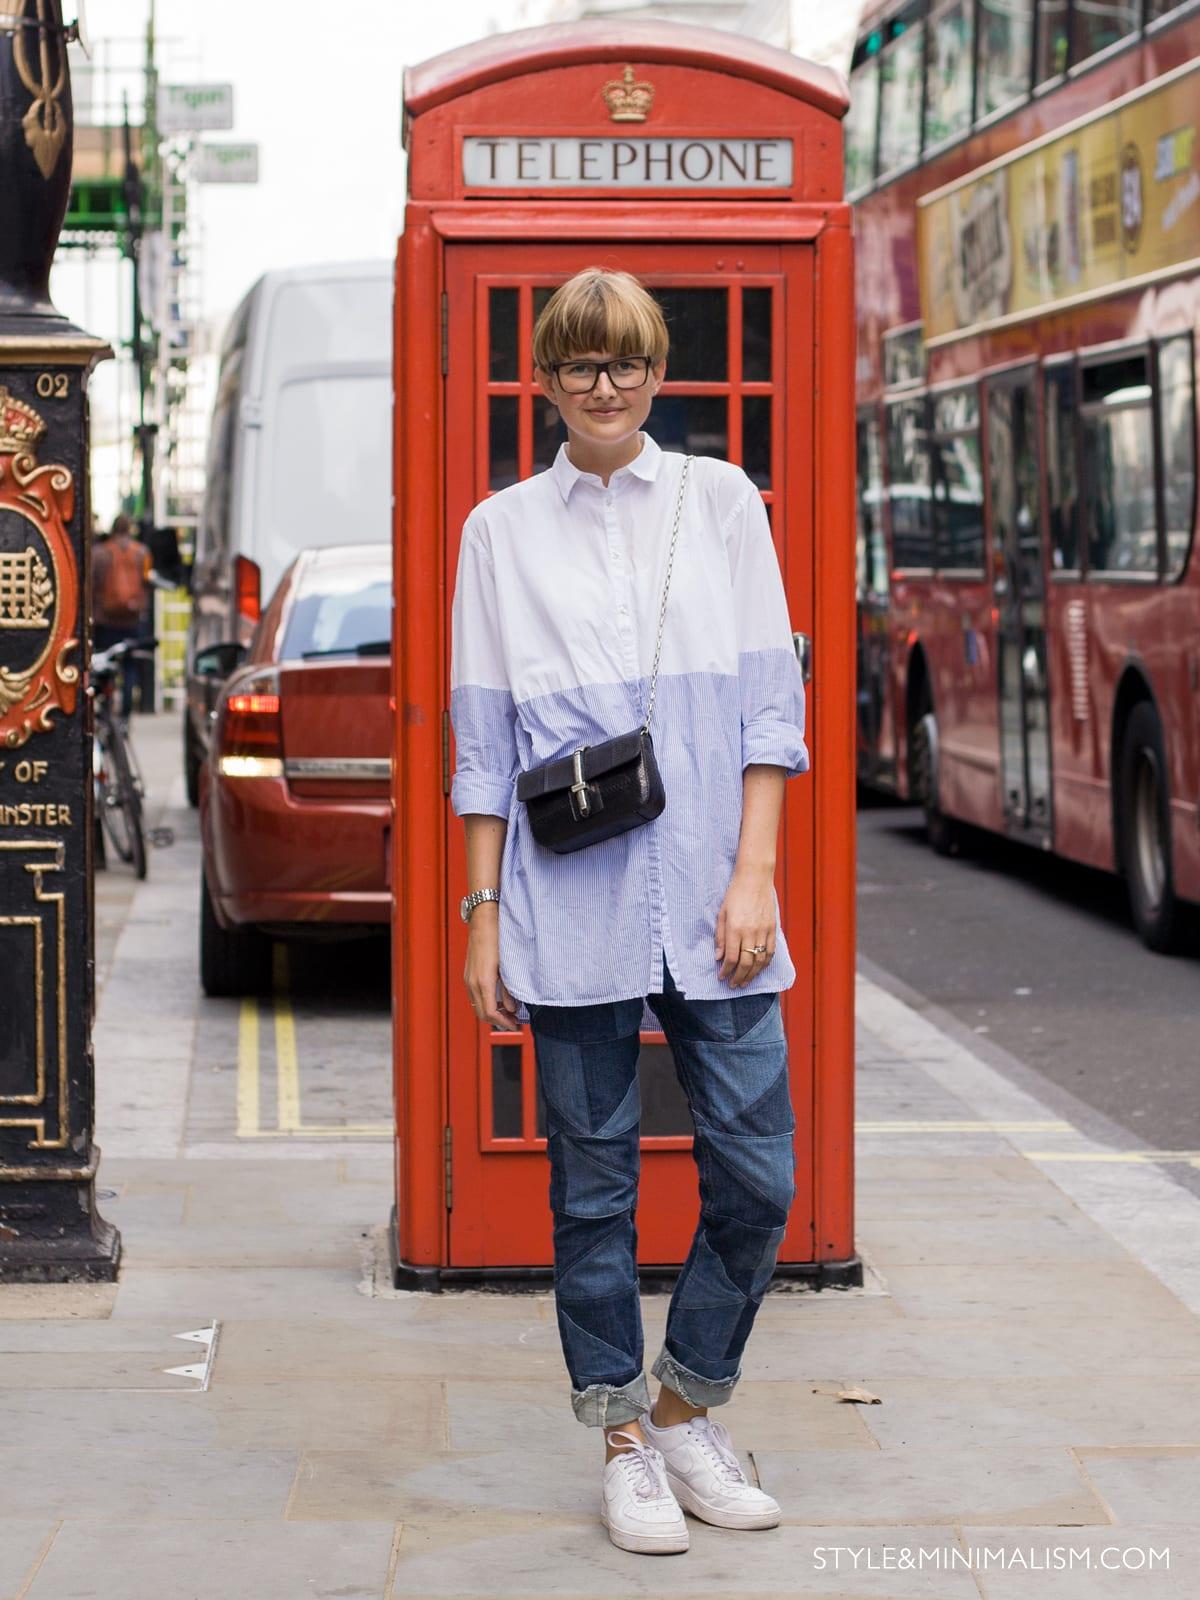 StyleANDMinimalism | LFW SS15 | Street Style | Day 1 | Street Style Photographer